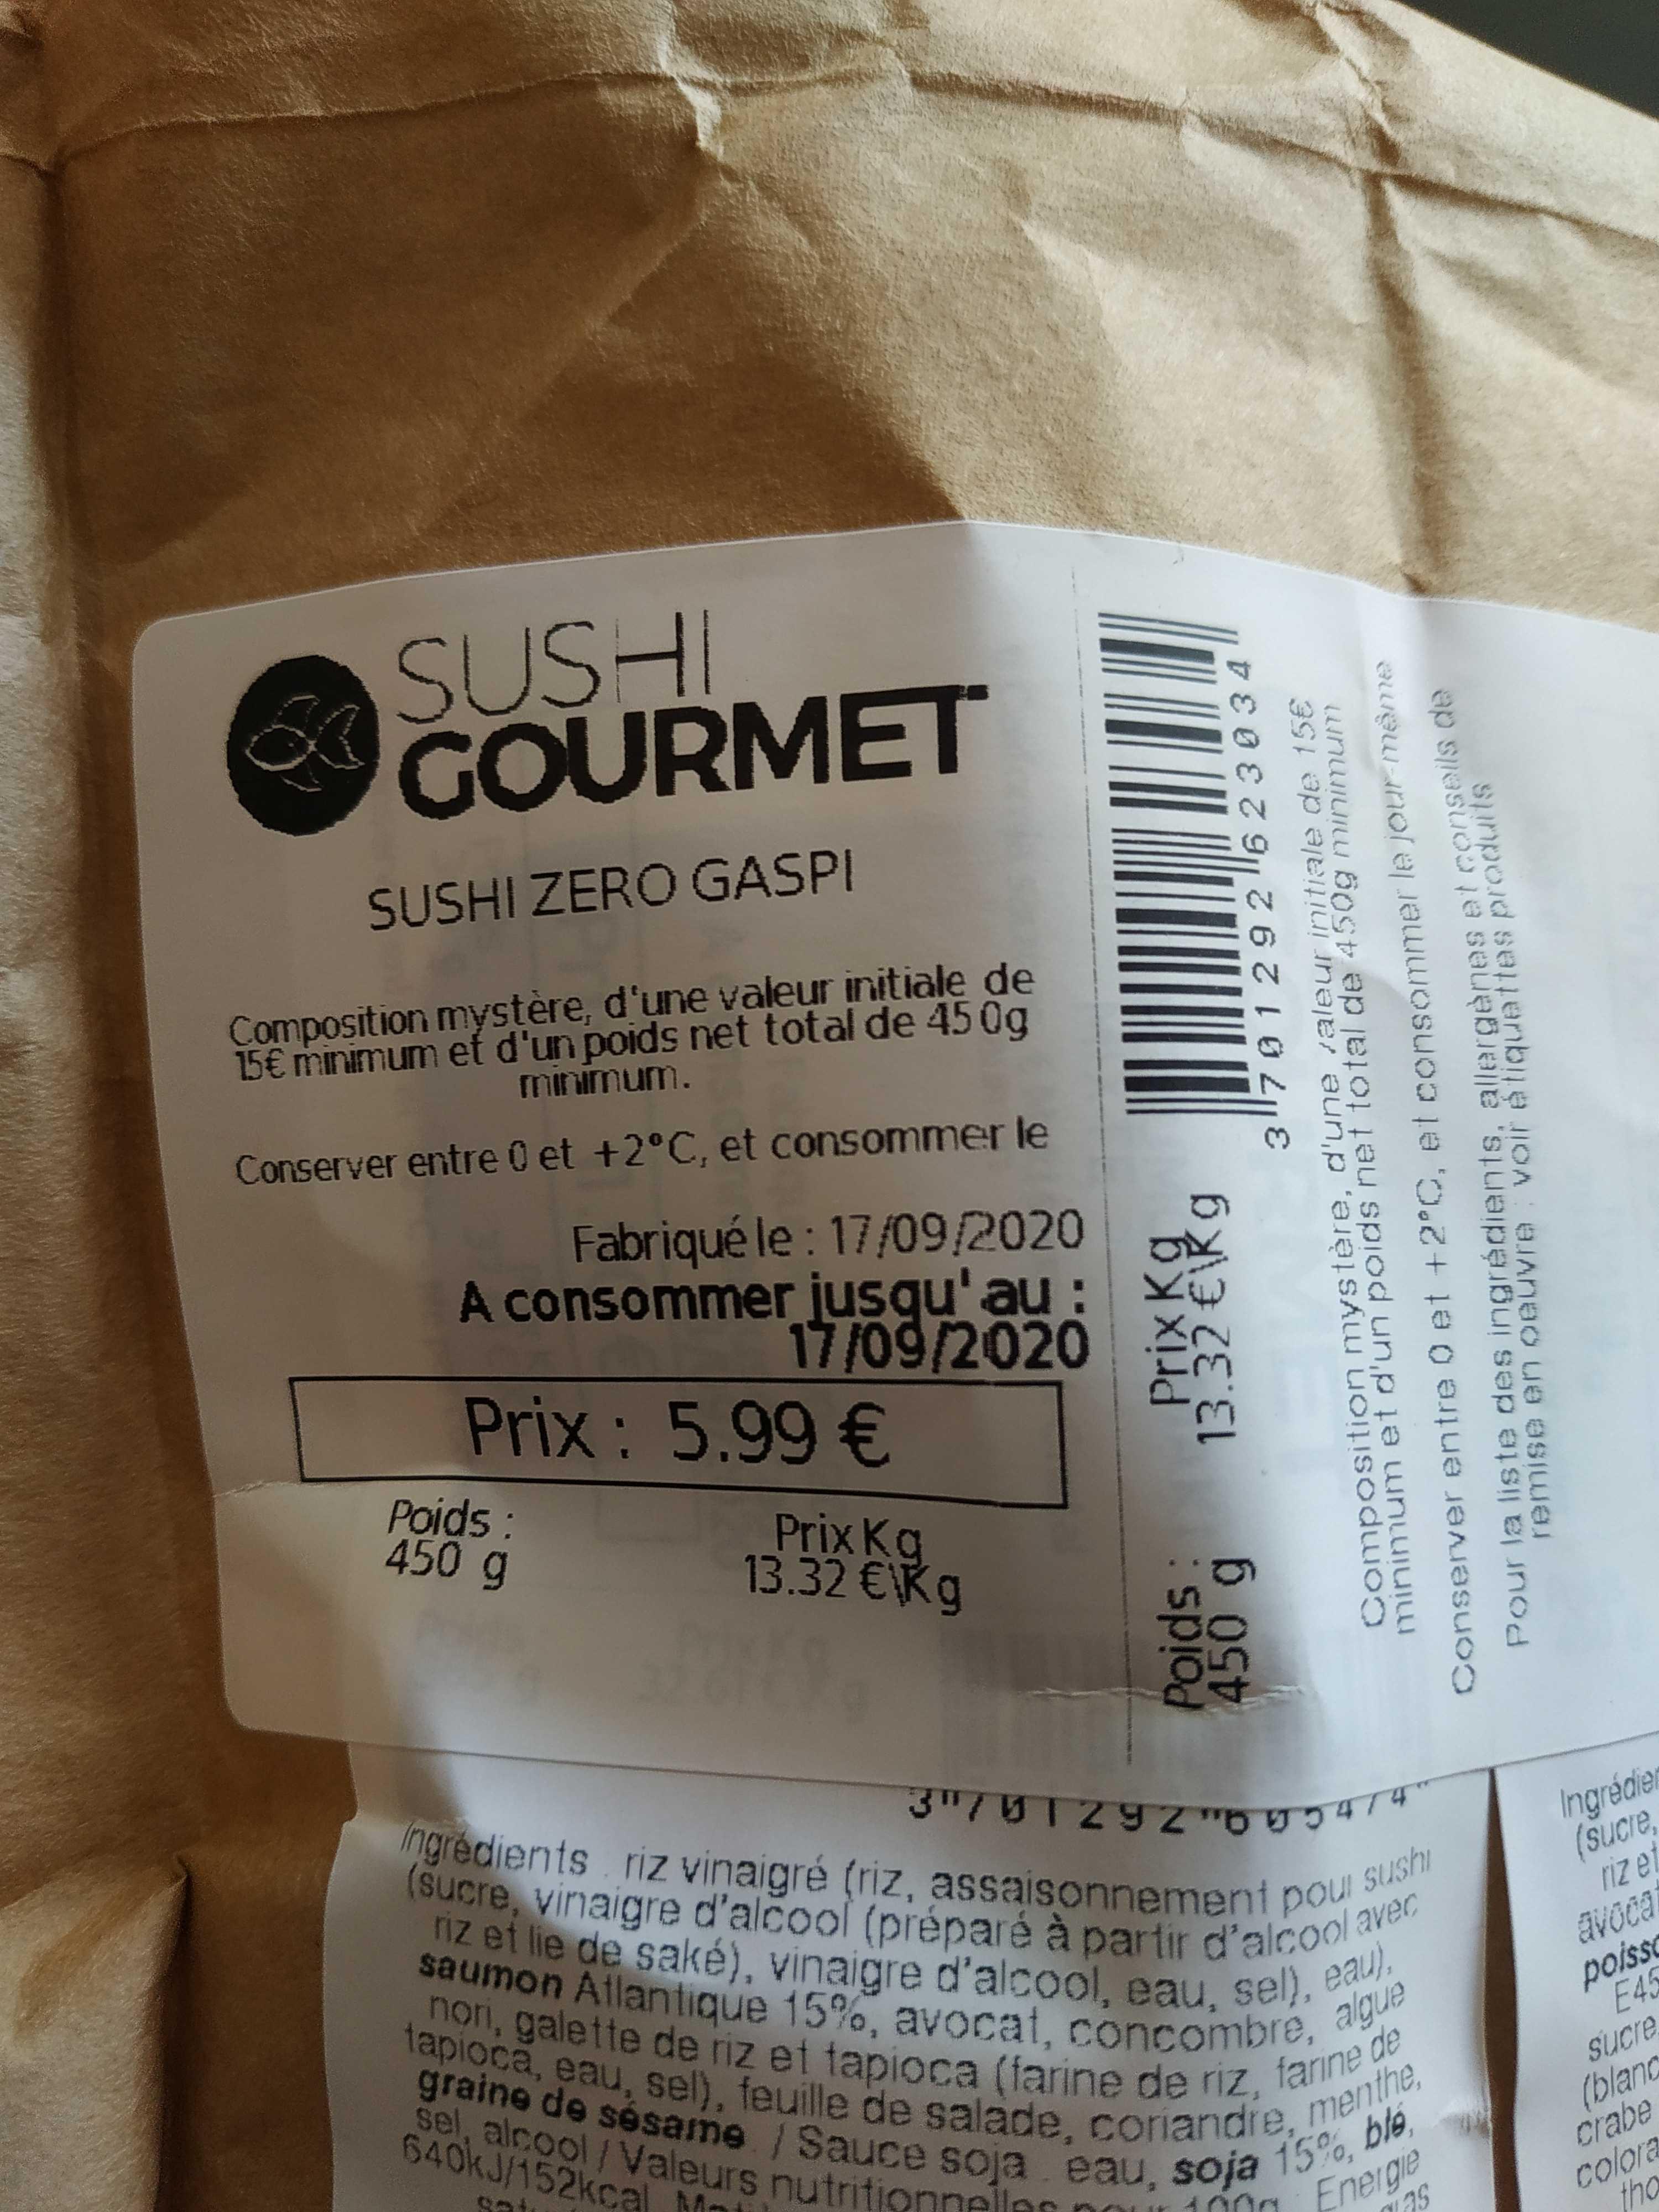 Paquet de Sushi Gourmet Zéro Gaspi (450 g) - Longuenesse / Saint Omer (62)